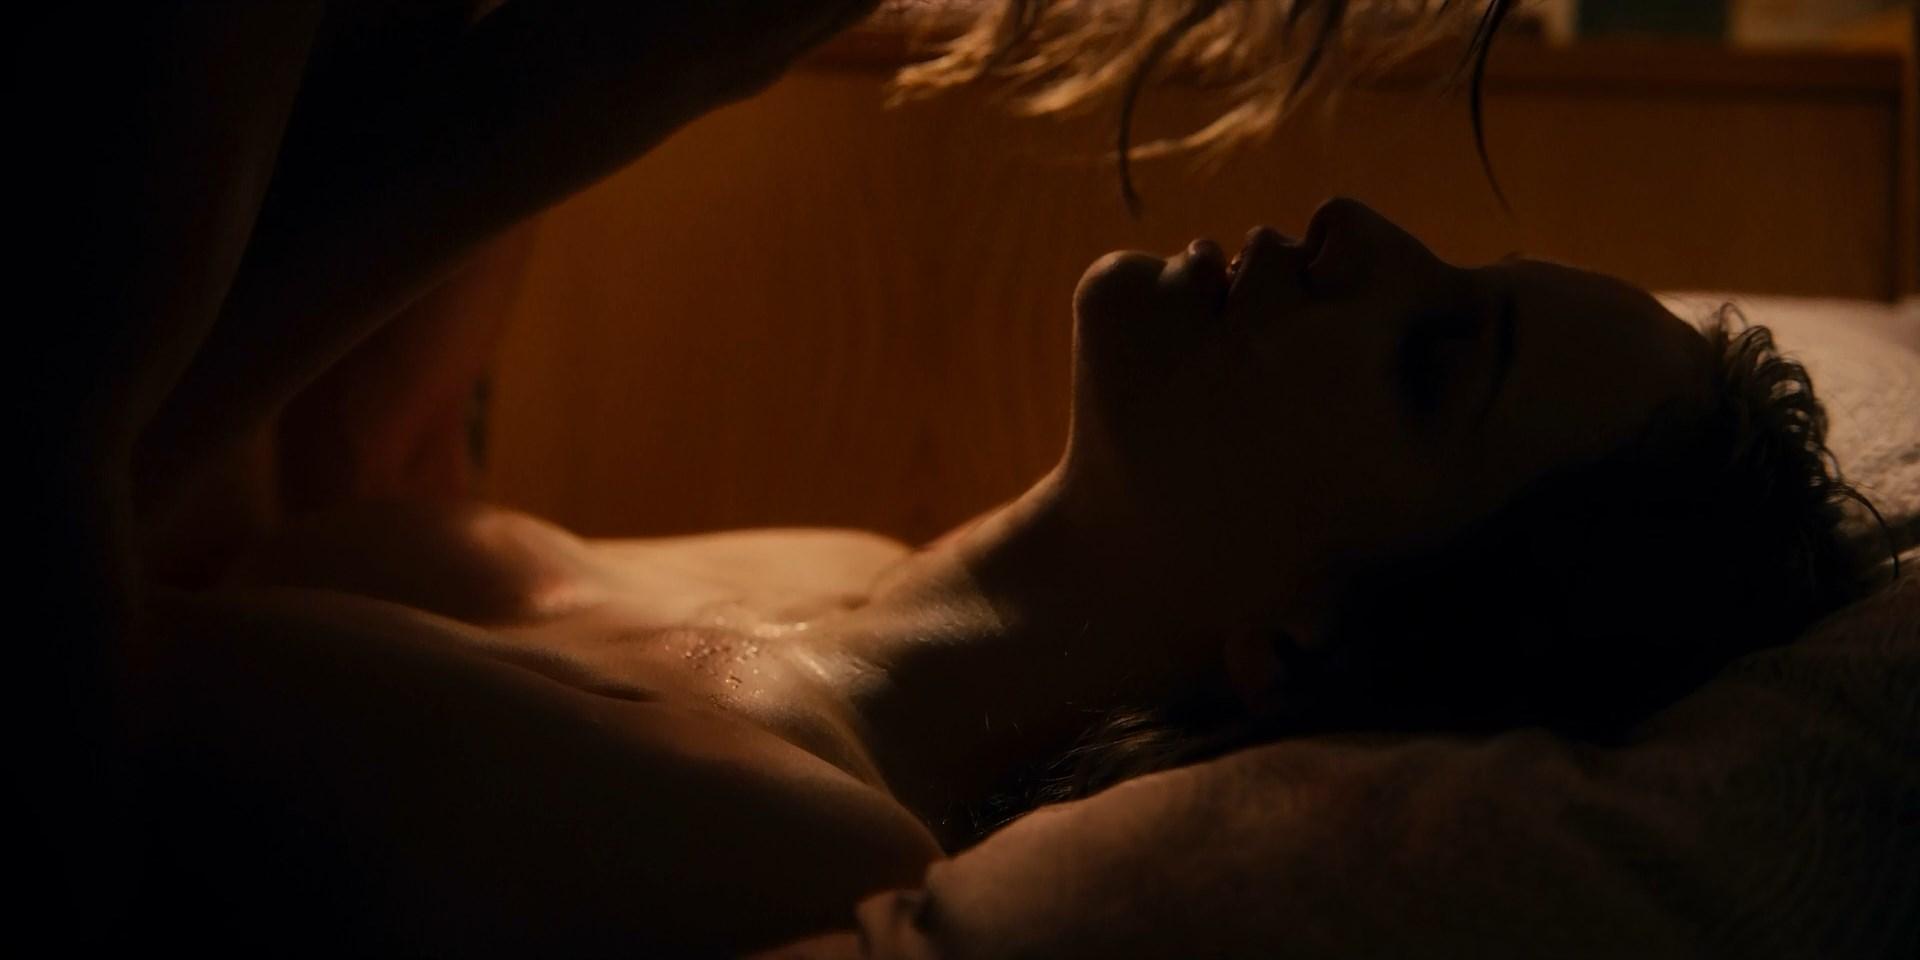 Lisa Vicari nude - Dark s02e01e04-06 (2019)